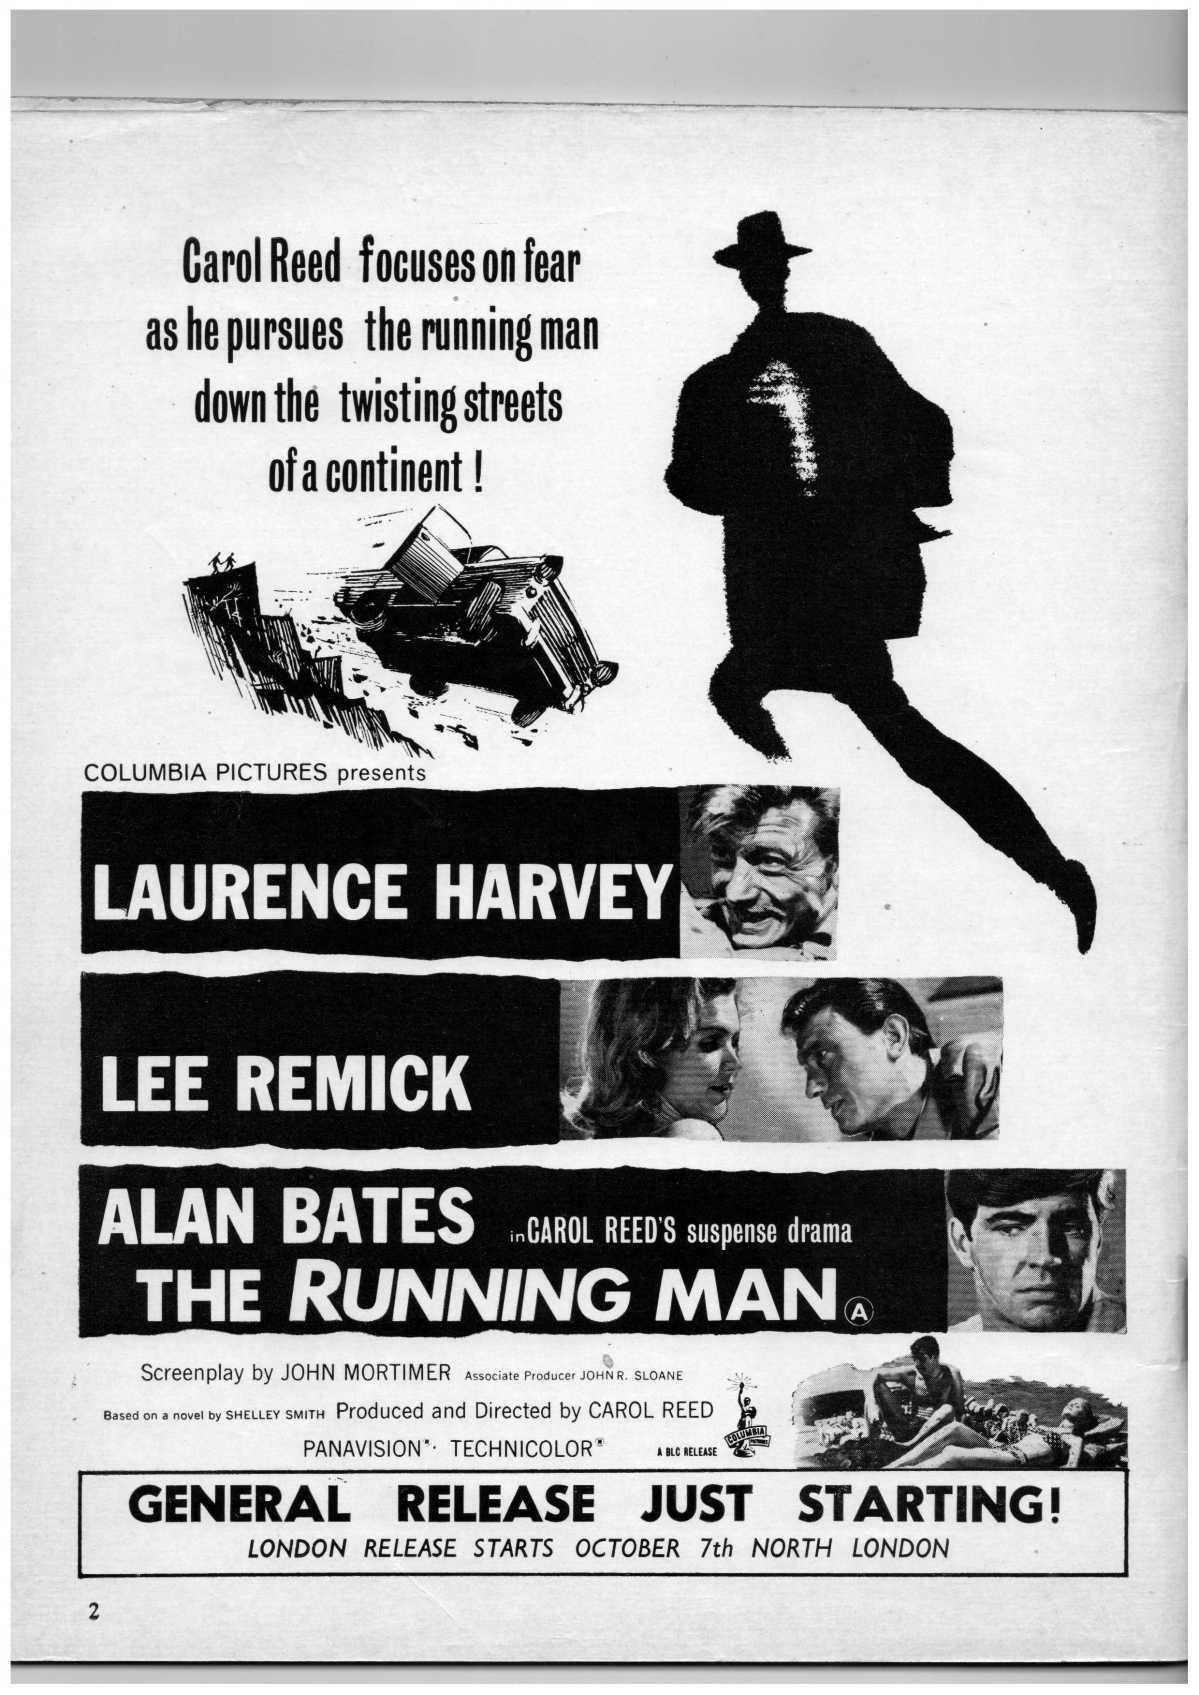 The Running Man (1963)****